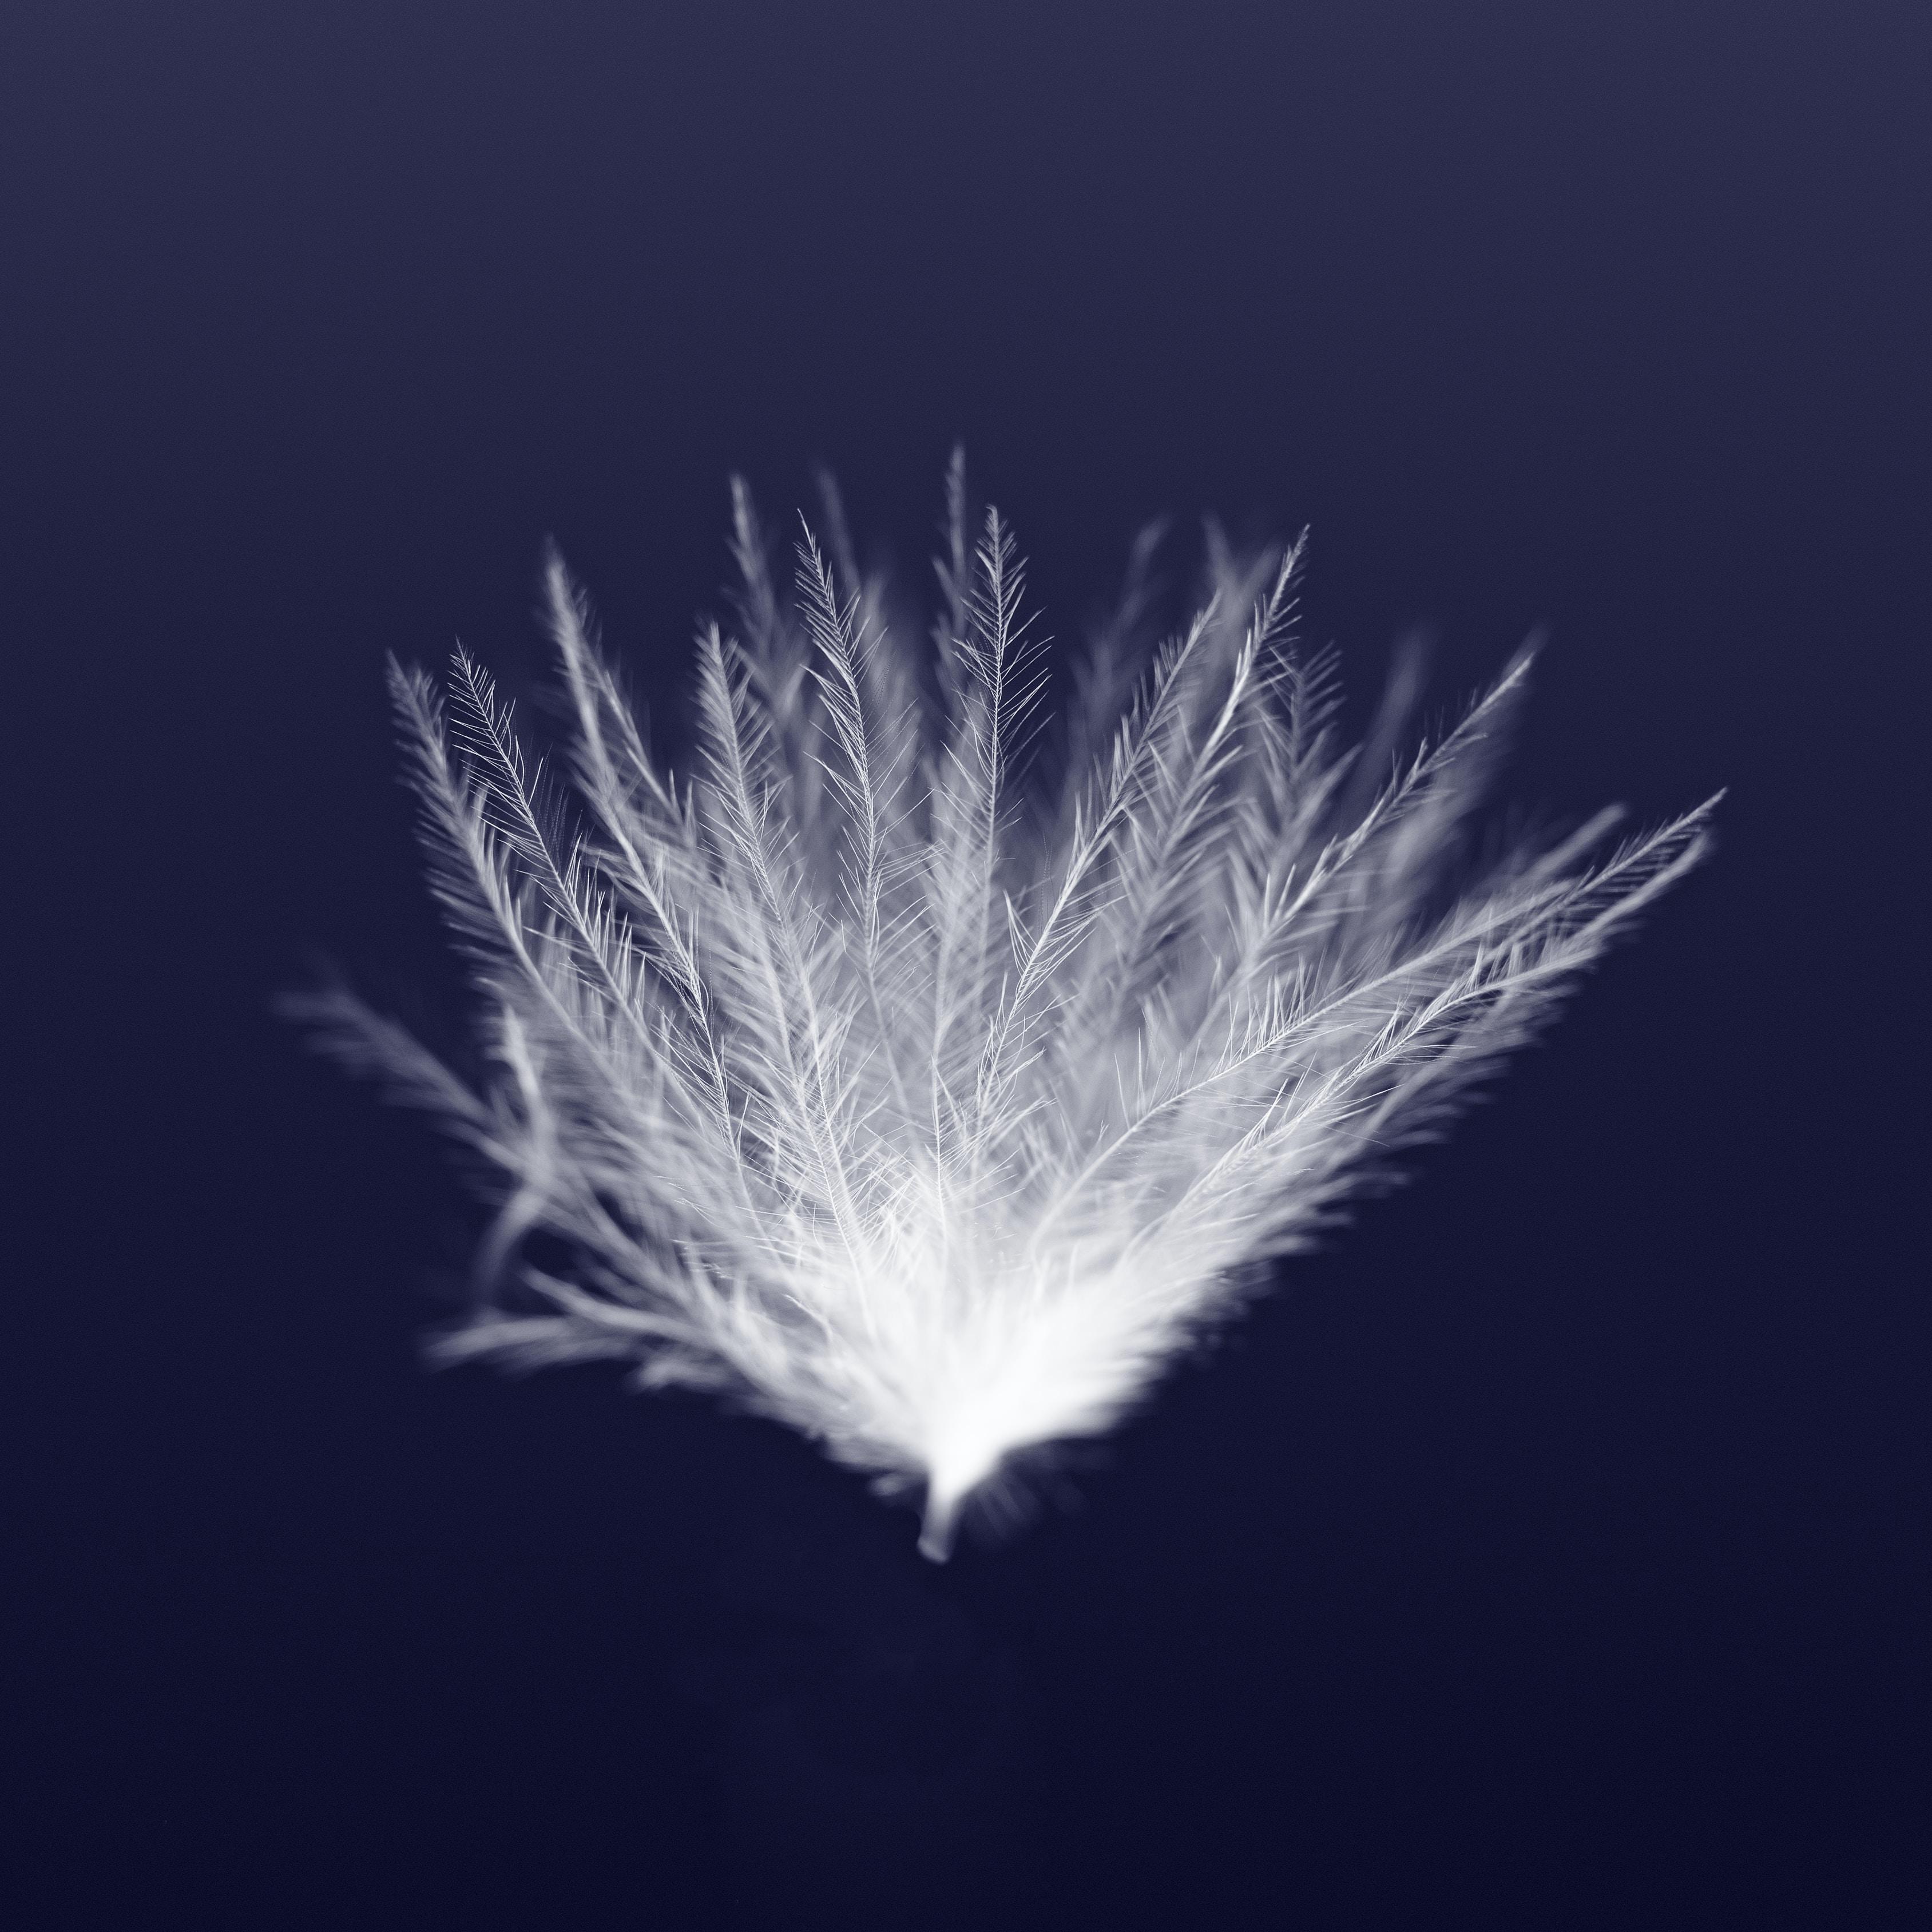 macro photography of white leaf